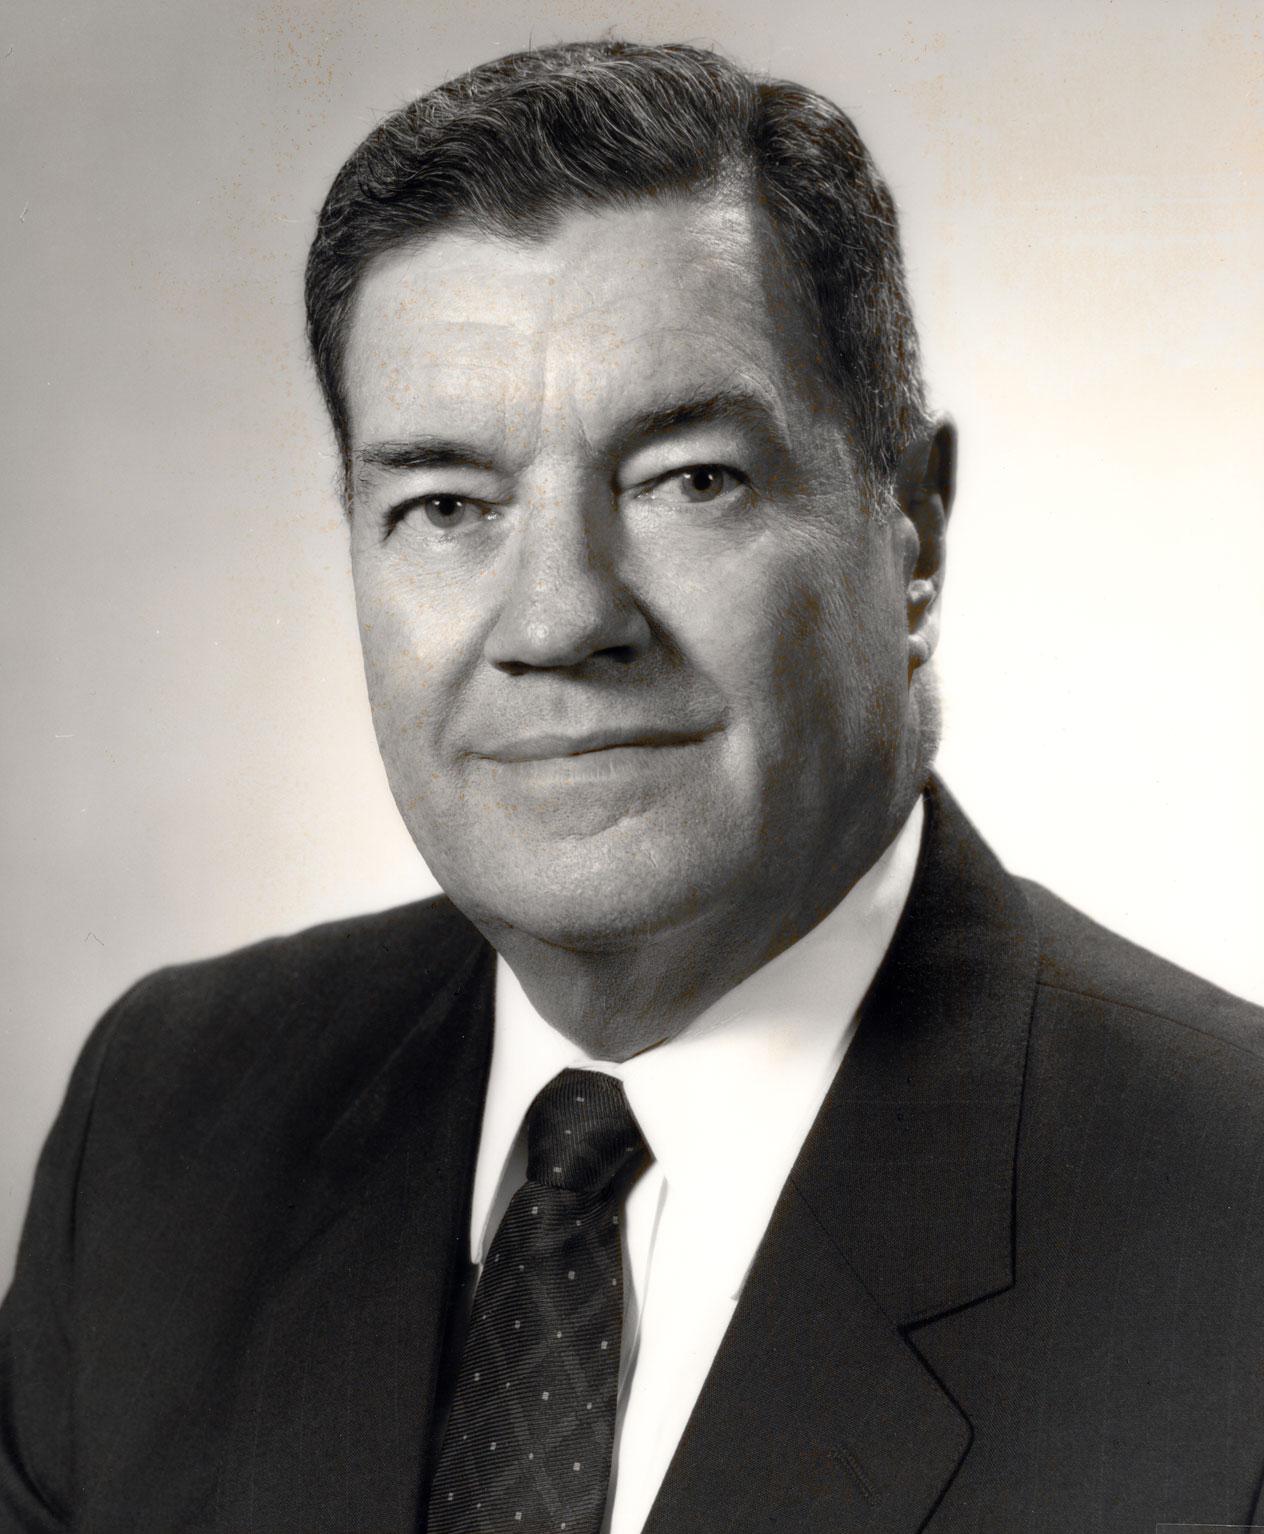 Roll of Honor - Lester P. Lamm